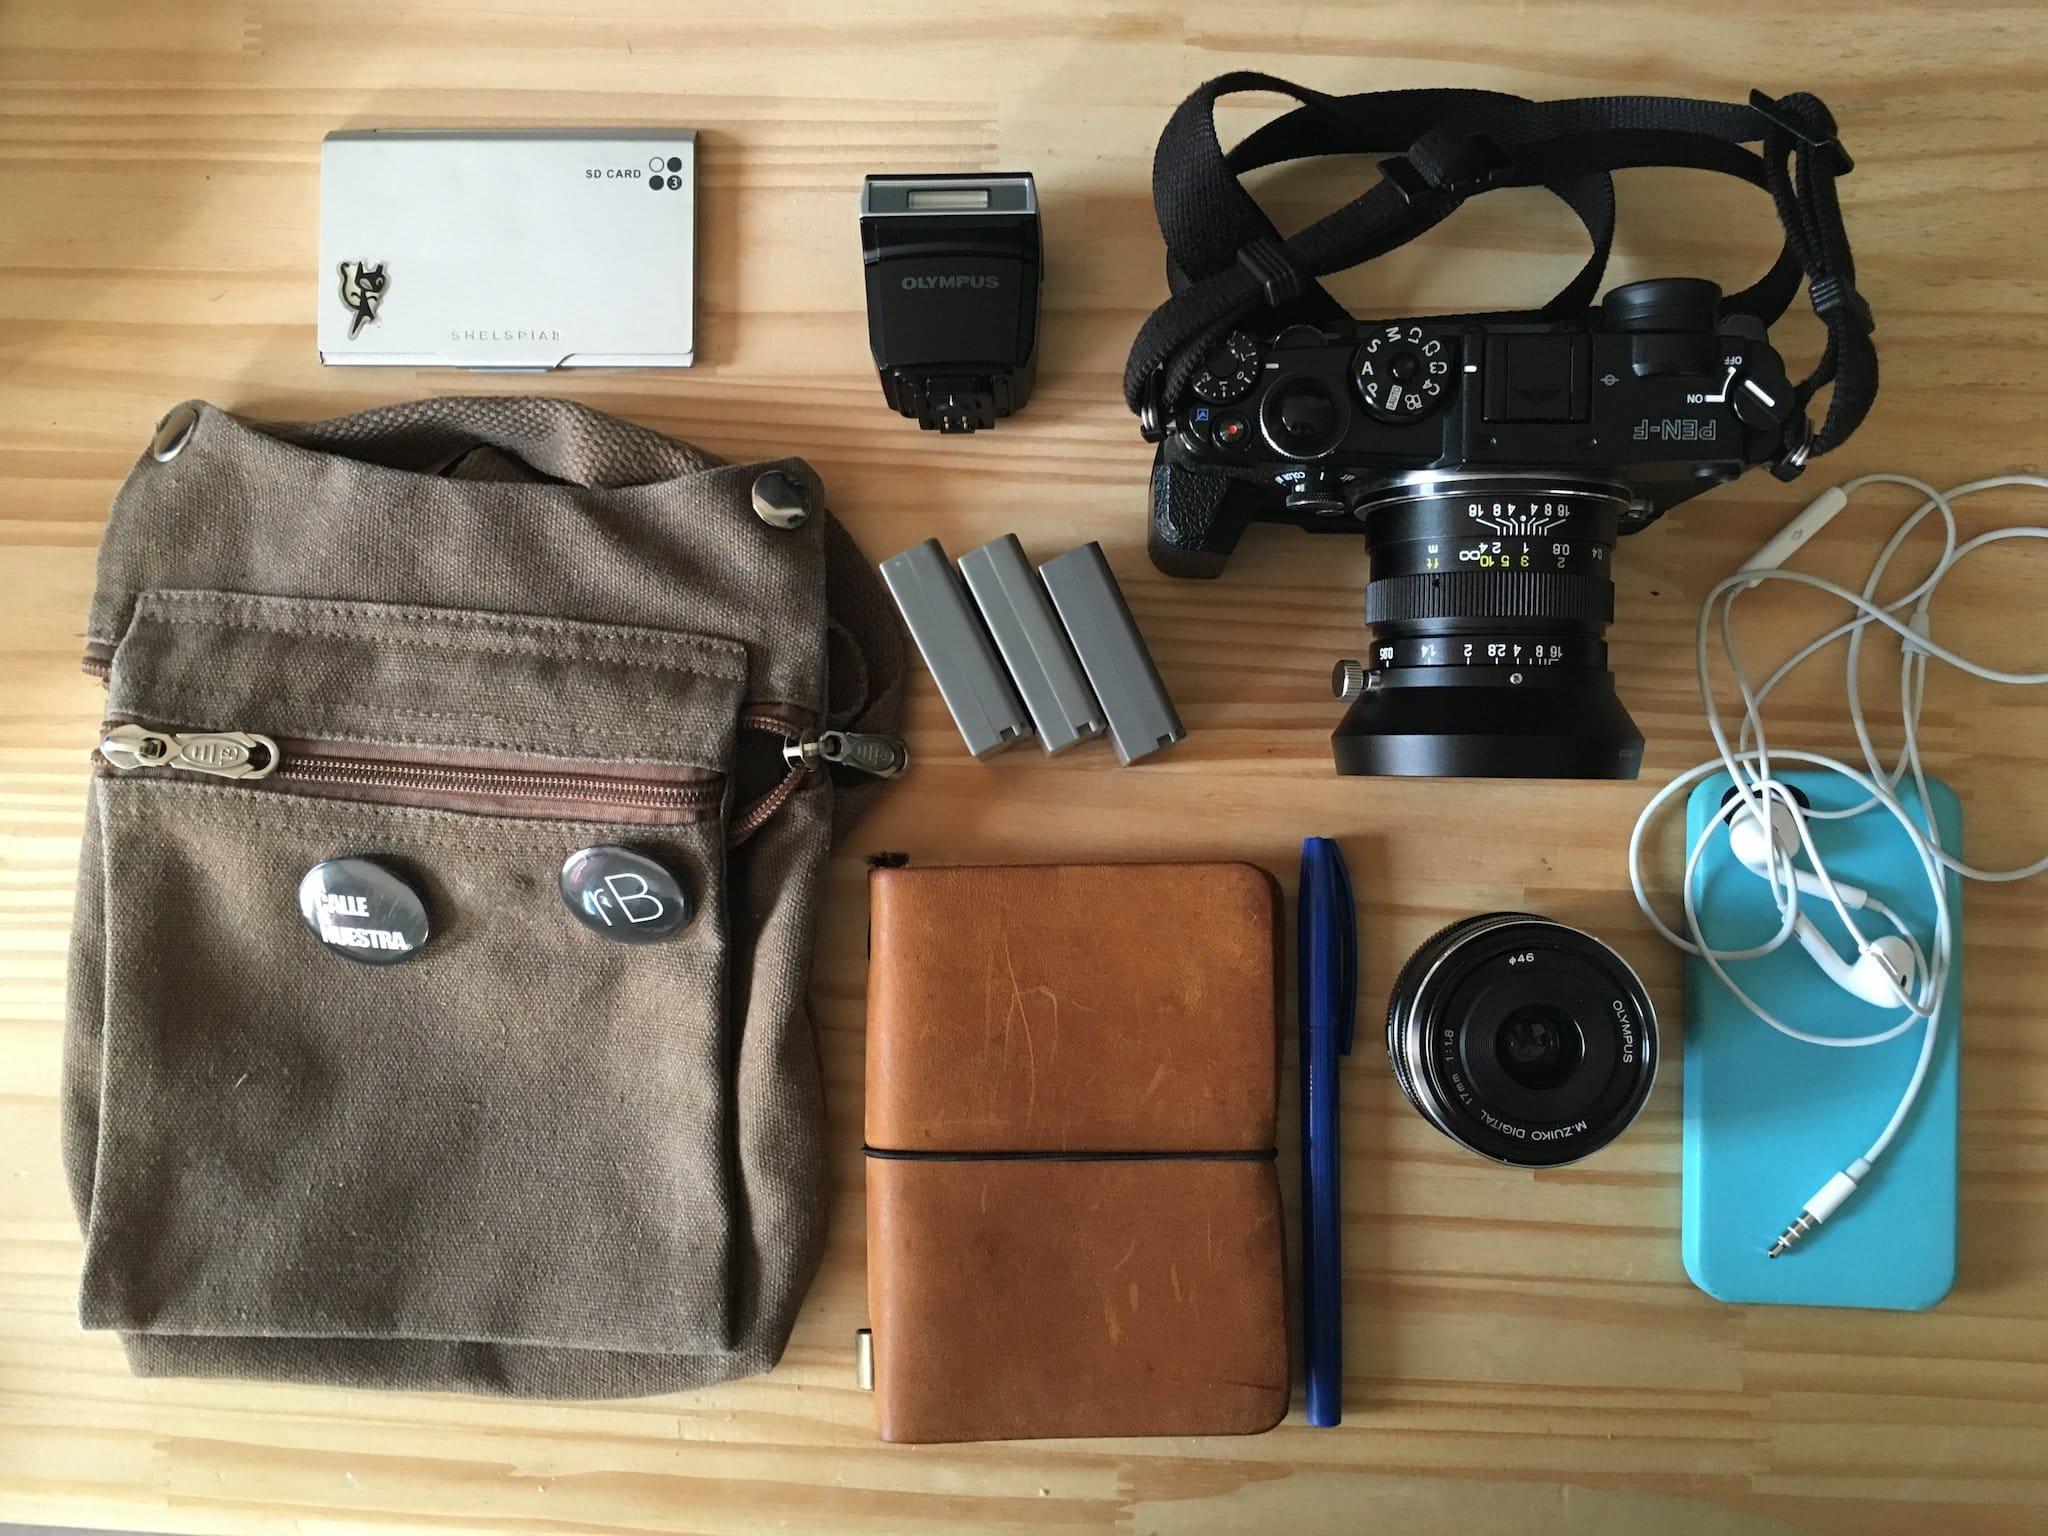 Raul Barroso's Camera Bag - Bag No. 155